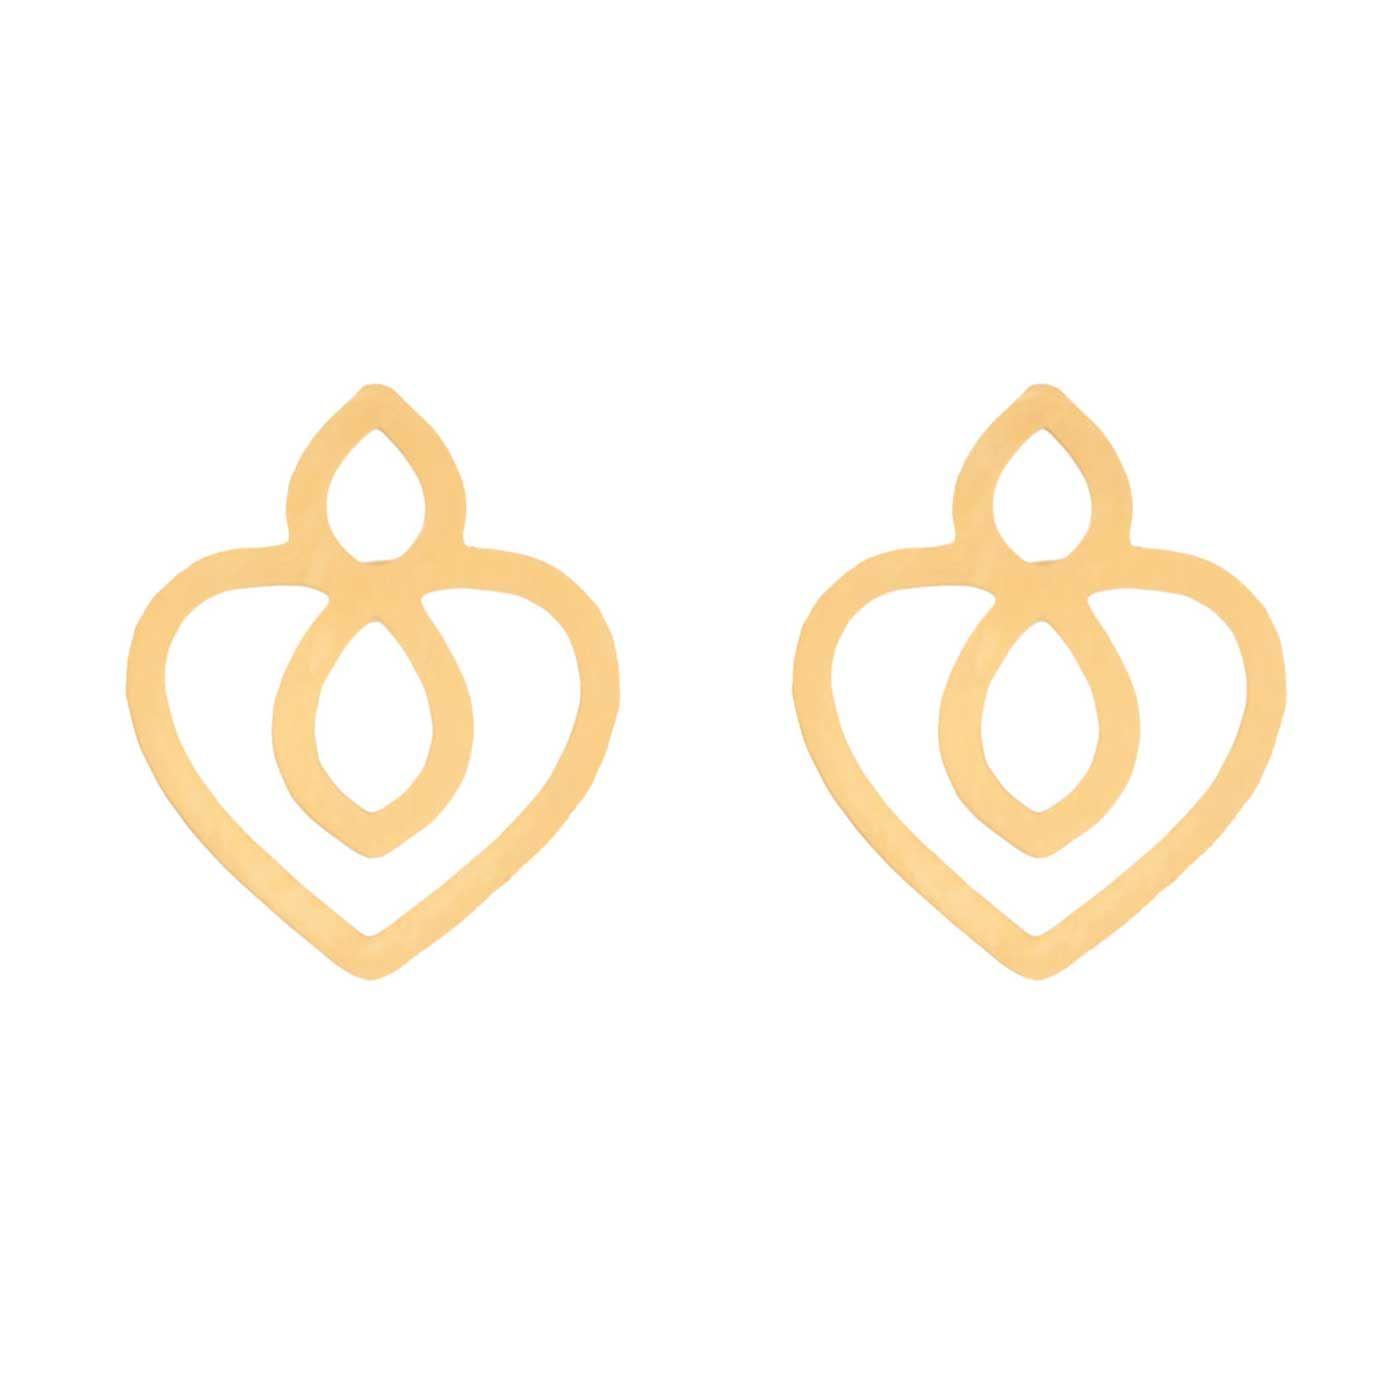 گوشواره طلا 18 عیار زنانه کانیار گالری کد GOA97 -  - 3